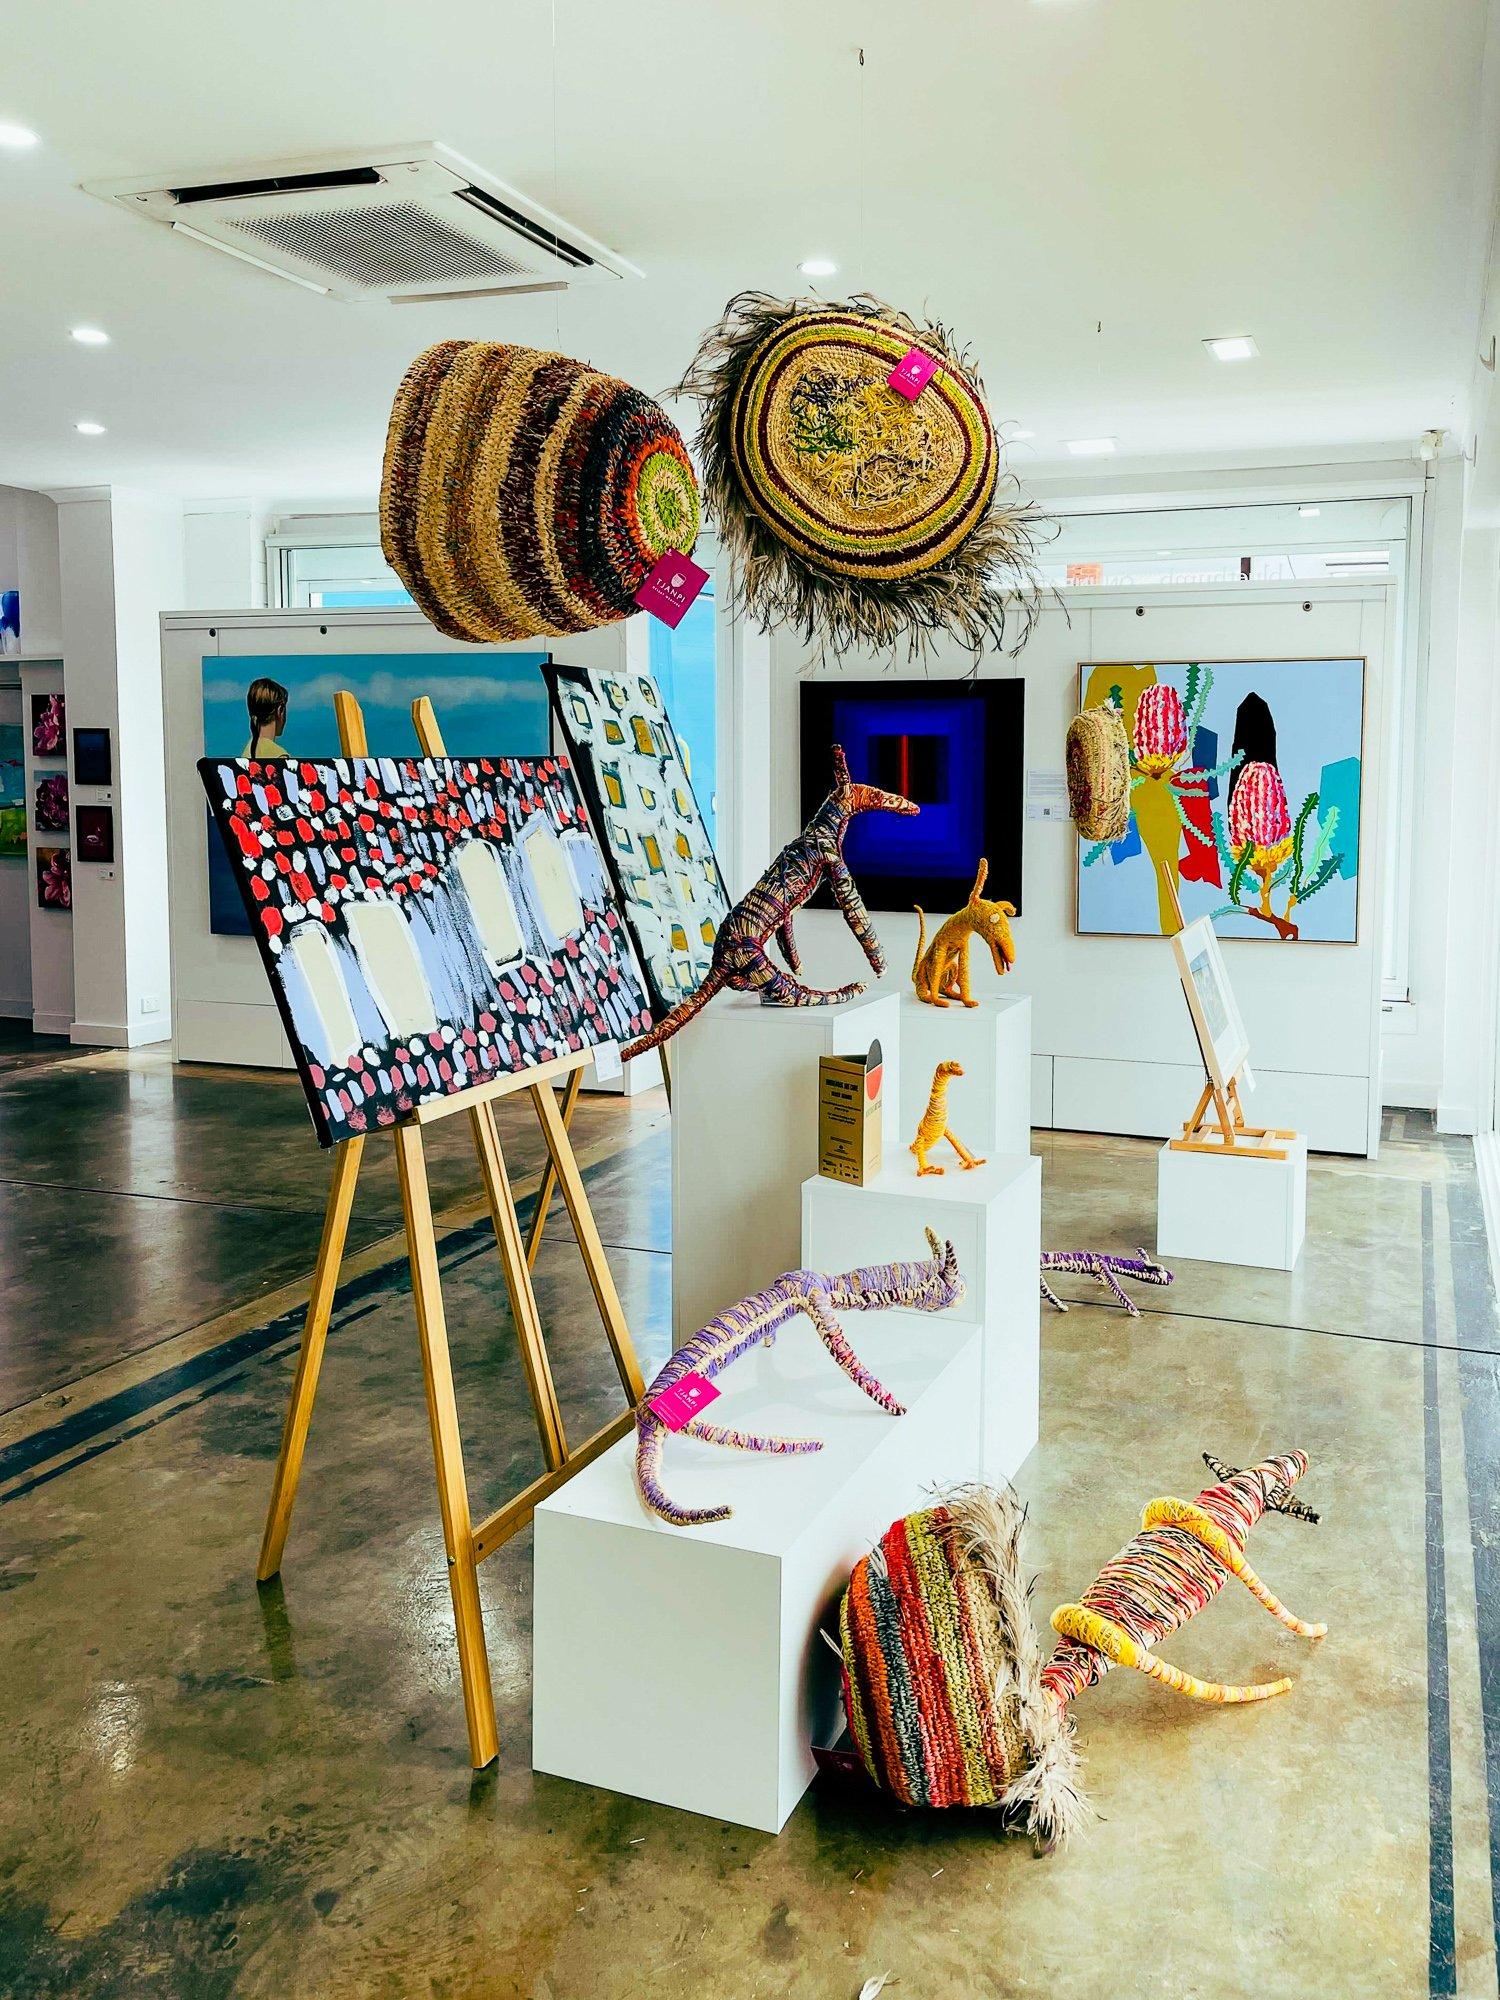 NAIDOC Week in the Bluethumb Adelaide gallery